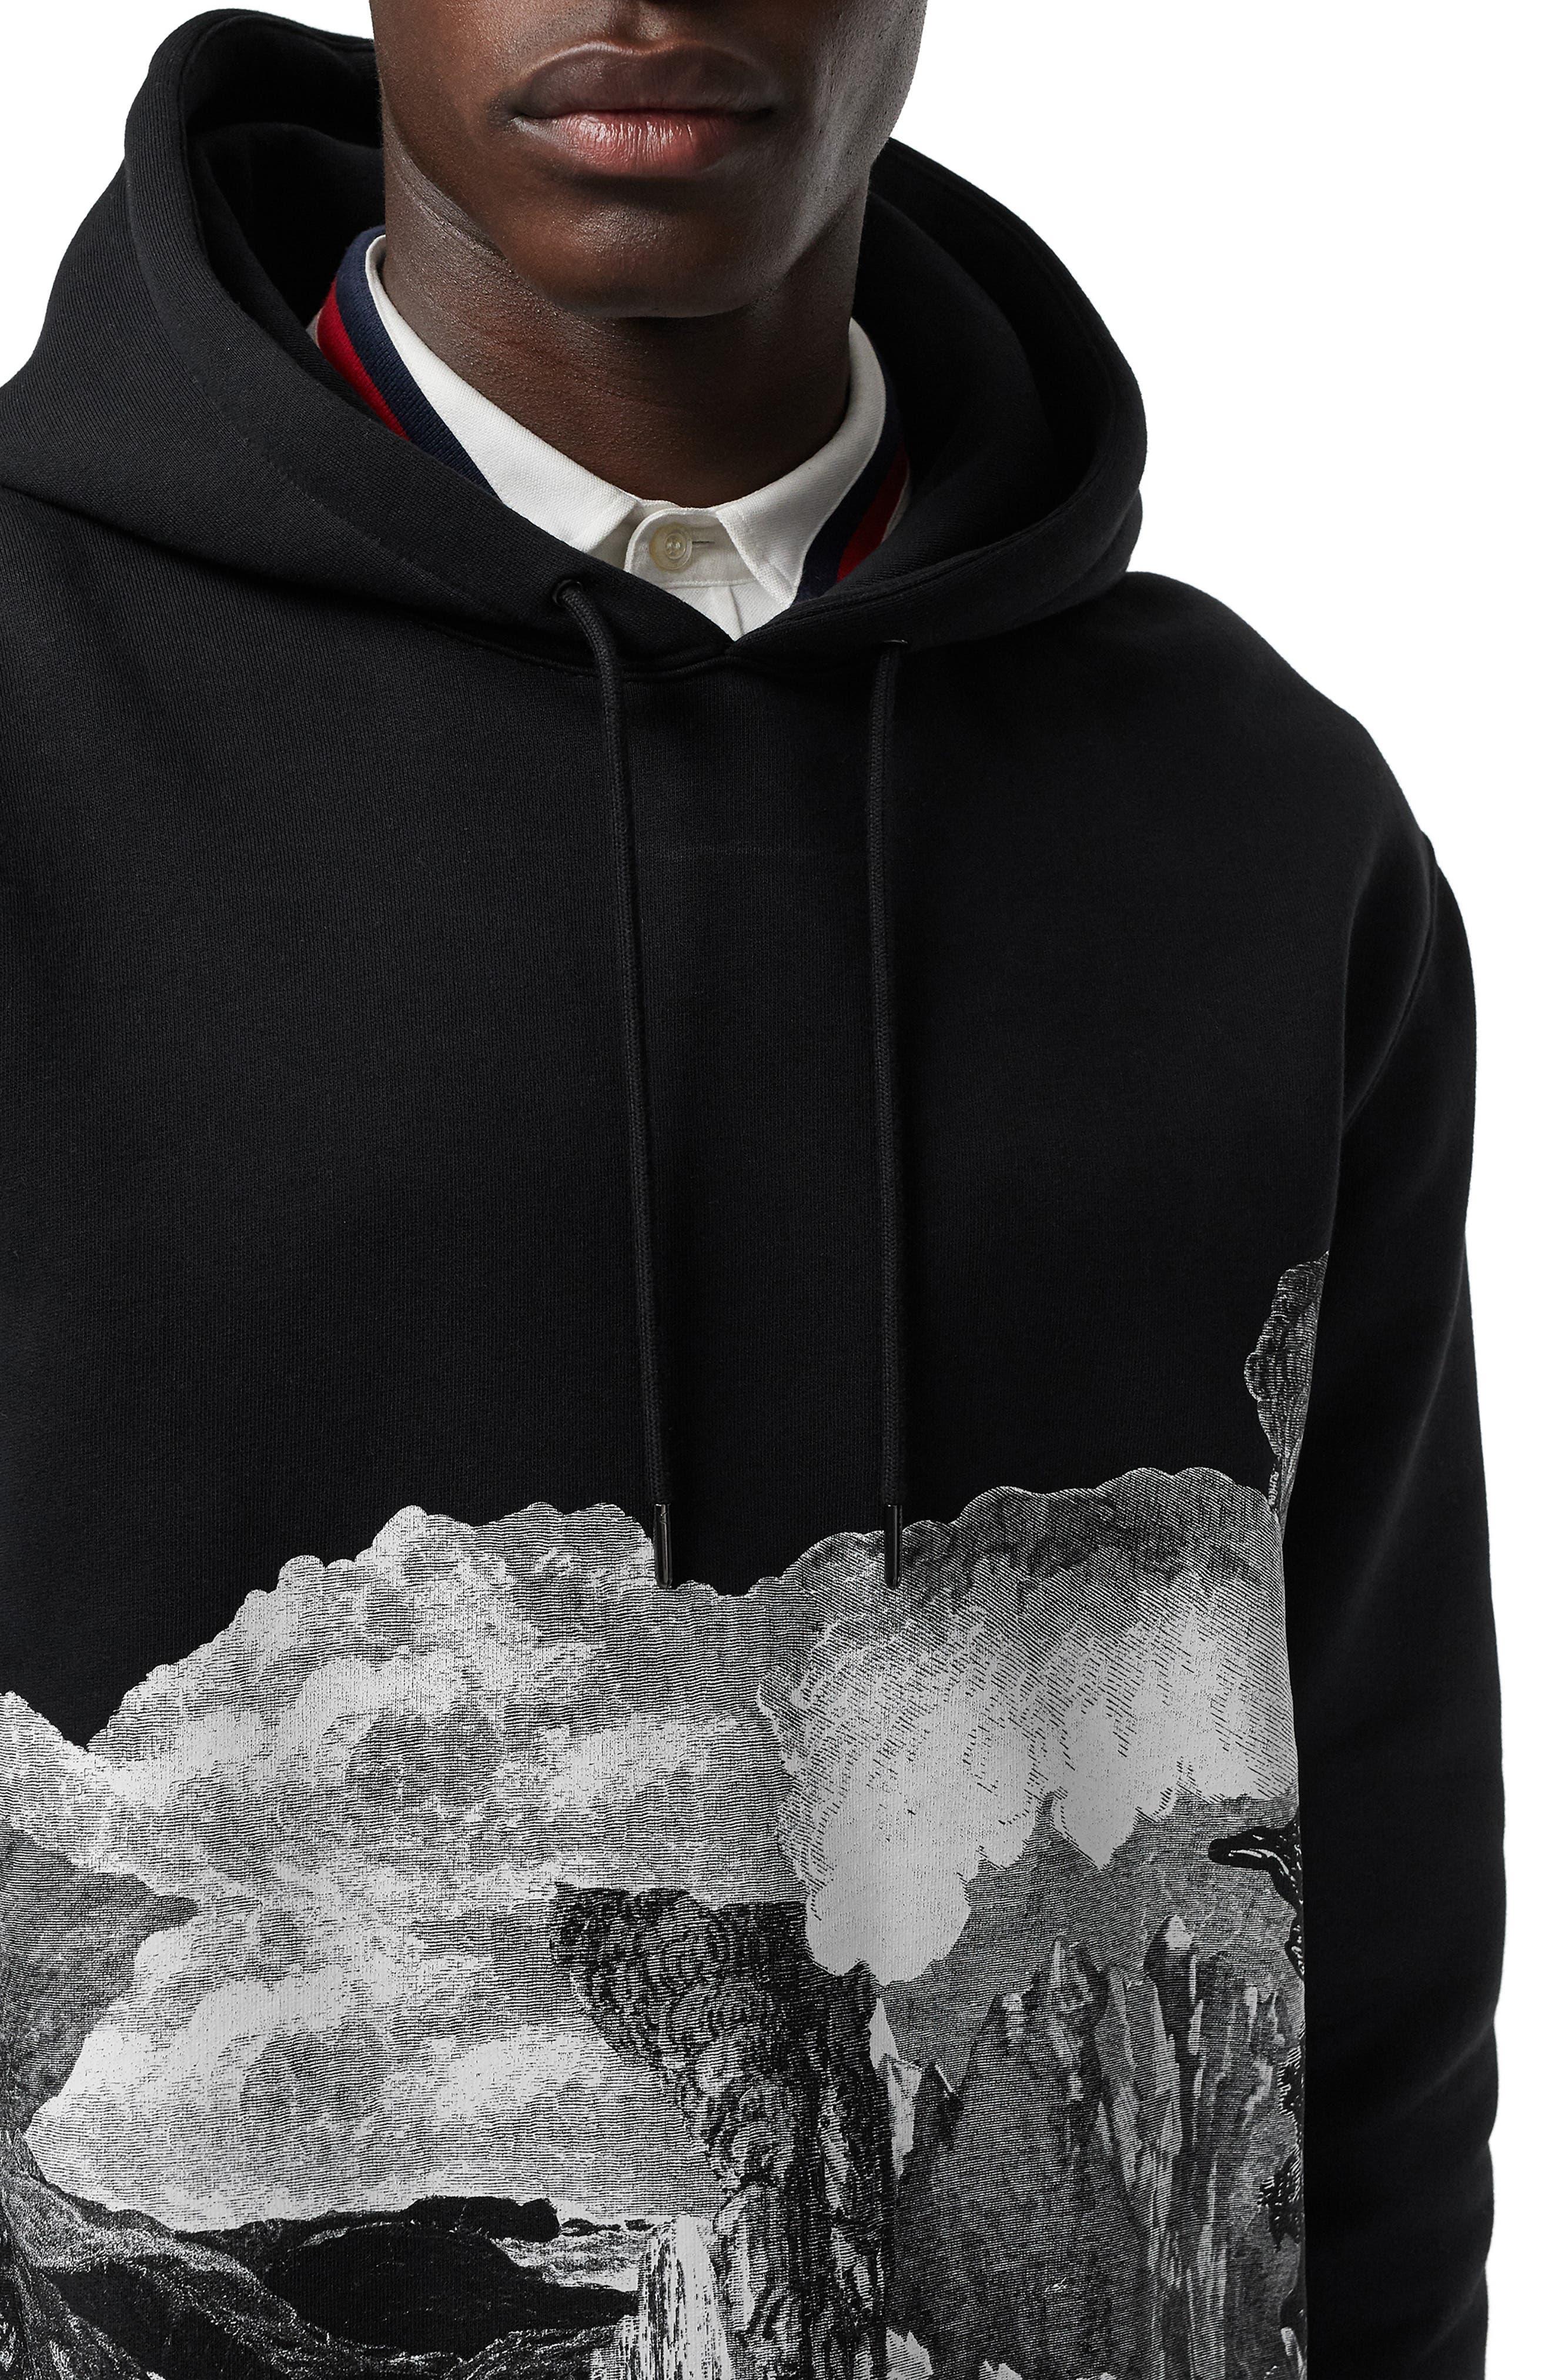 BURBERRY, Dreamscape Print Hooded Sweatshirt, Alternate thumbnail 3, color, BLACK